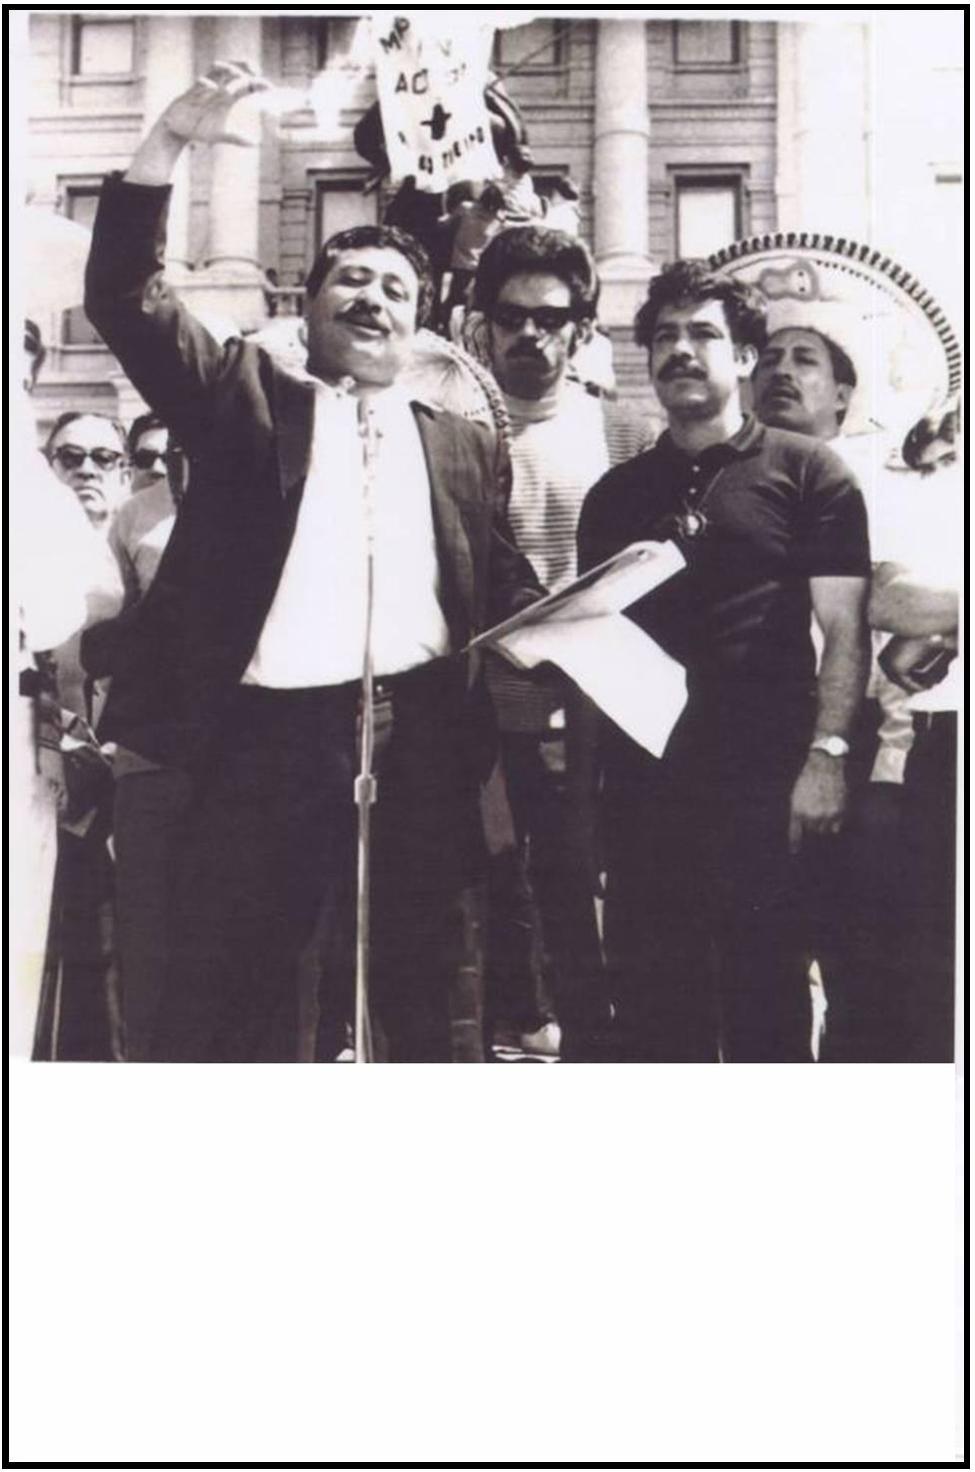 Lunes Con Lalo Delgado: Wisdom For Your Week  To A Different Drum: Walker  Lindh And The San Patricios And El Paso Writer Updates: Luis Rodriguez, Gaspar  De